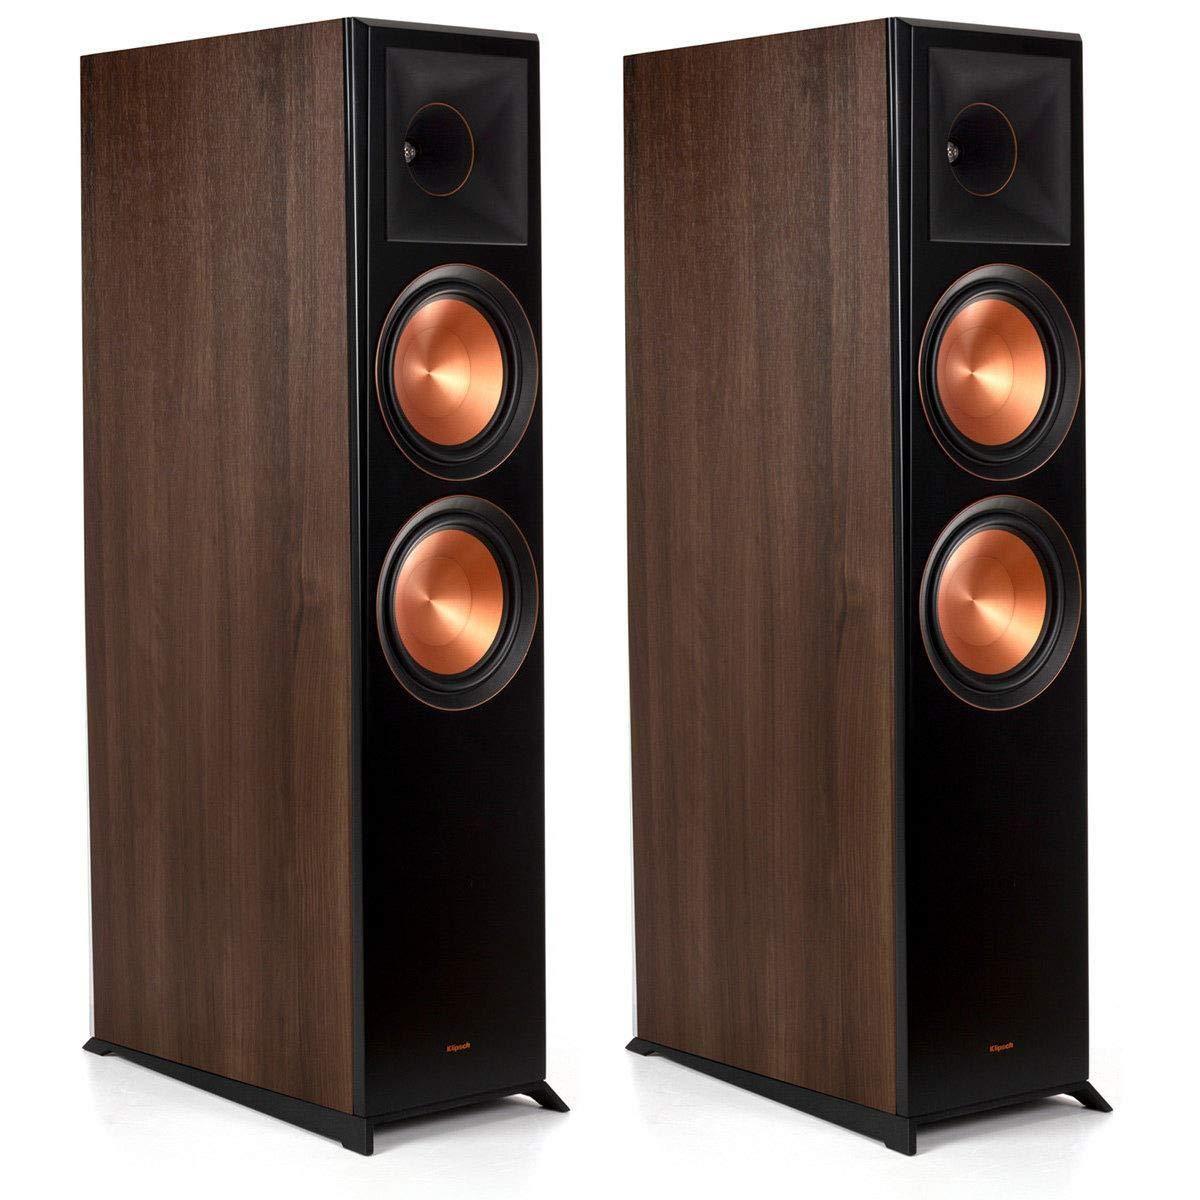 Klipsch Rp 8060fa Floorstanding Speaker Dolby Atmos Pair Walnut Products In 2019 Dolby Atmos Portable Projector Screen Floor Speakers